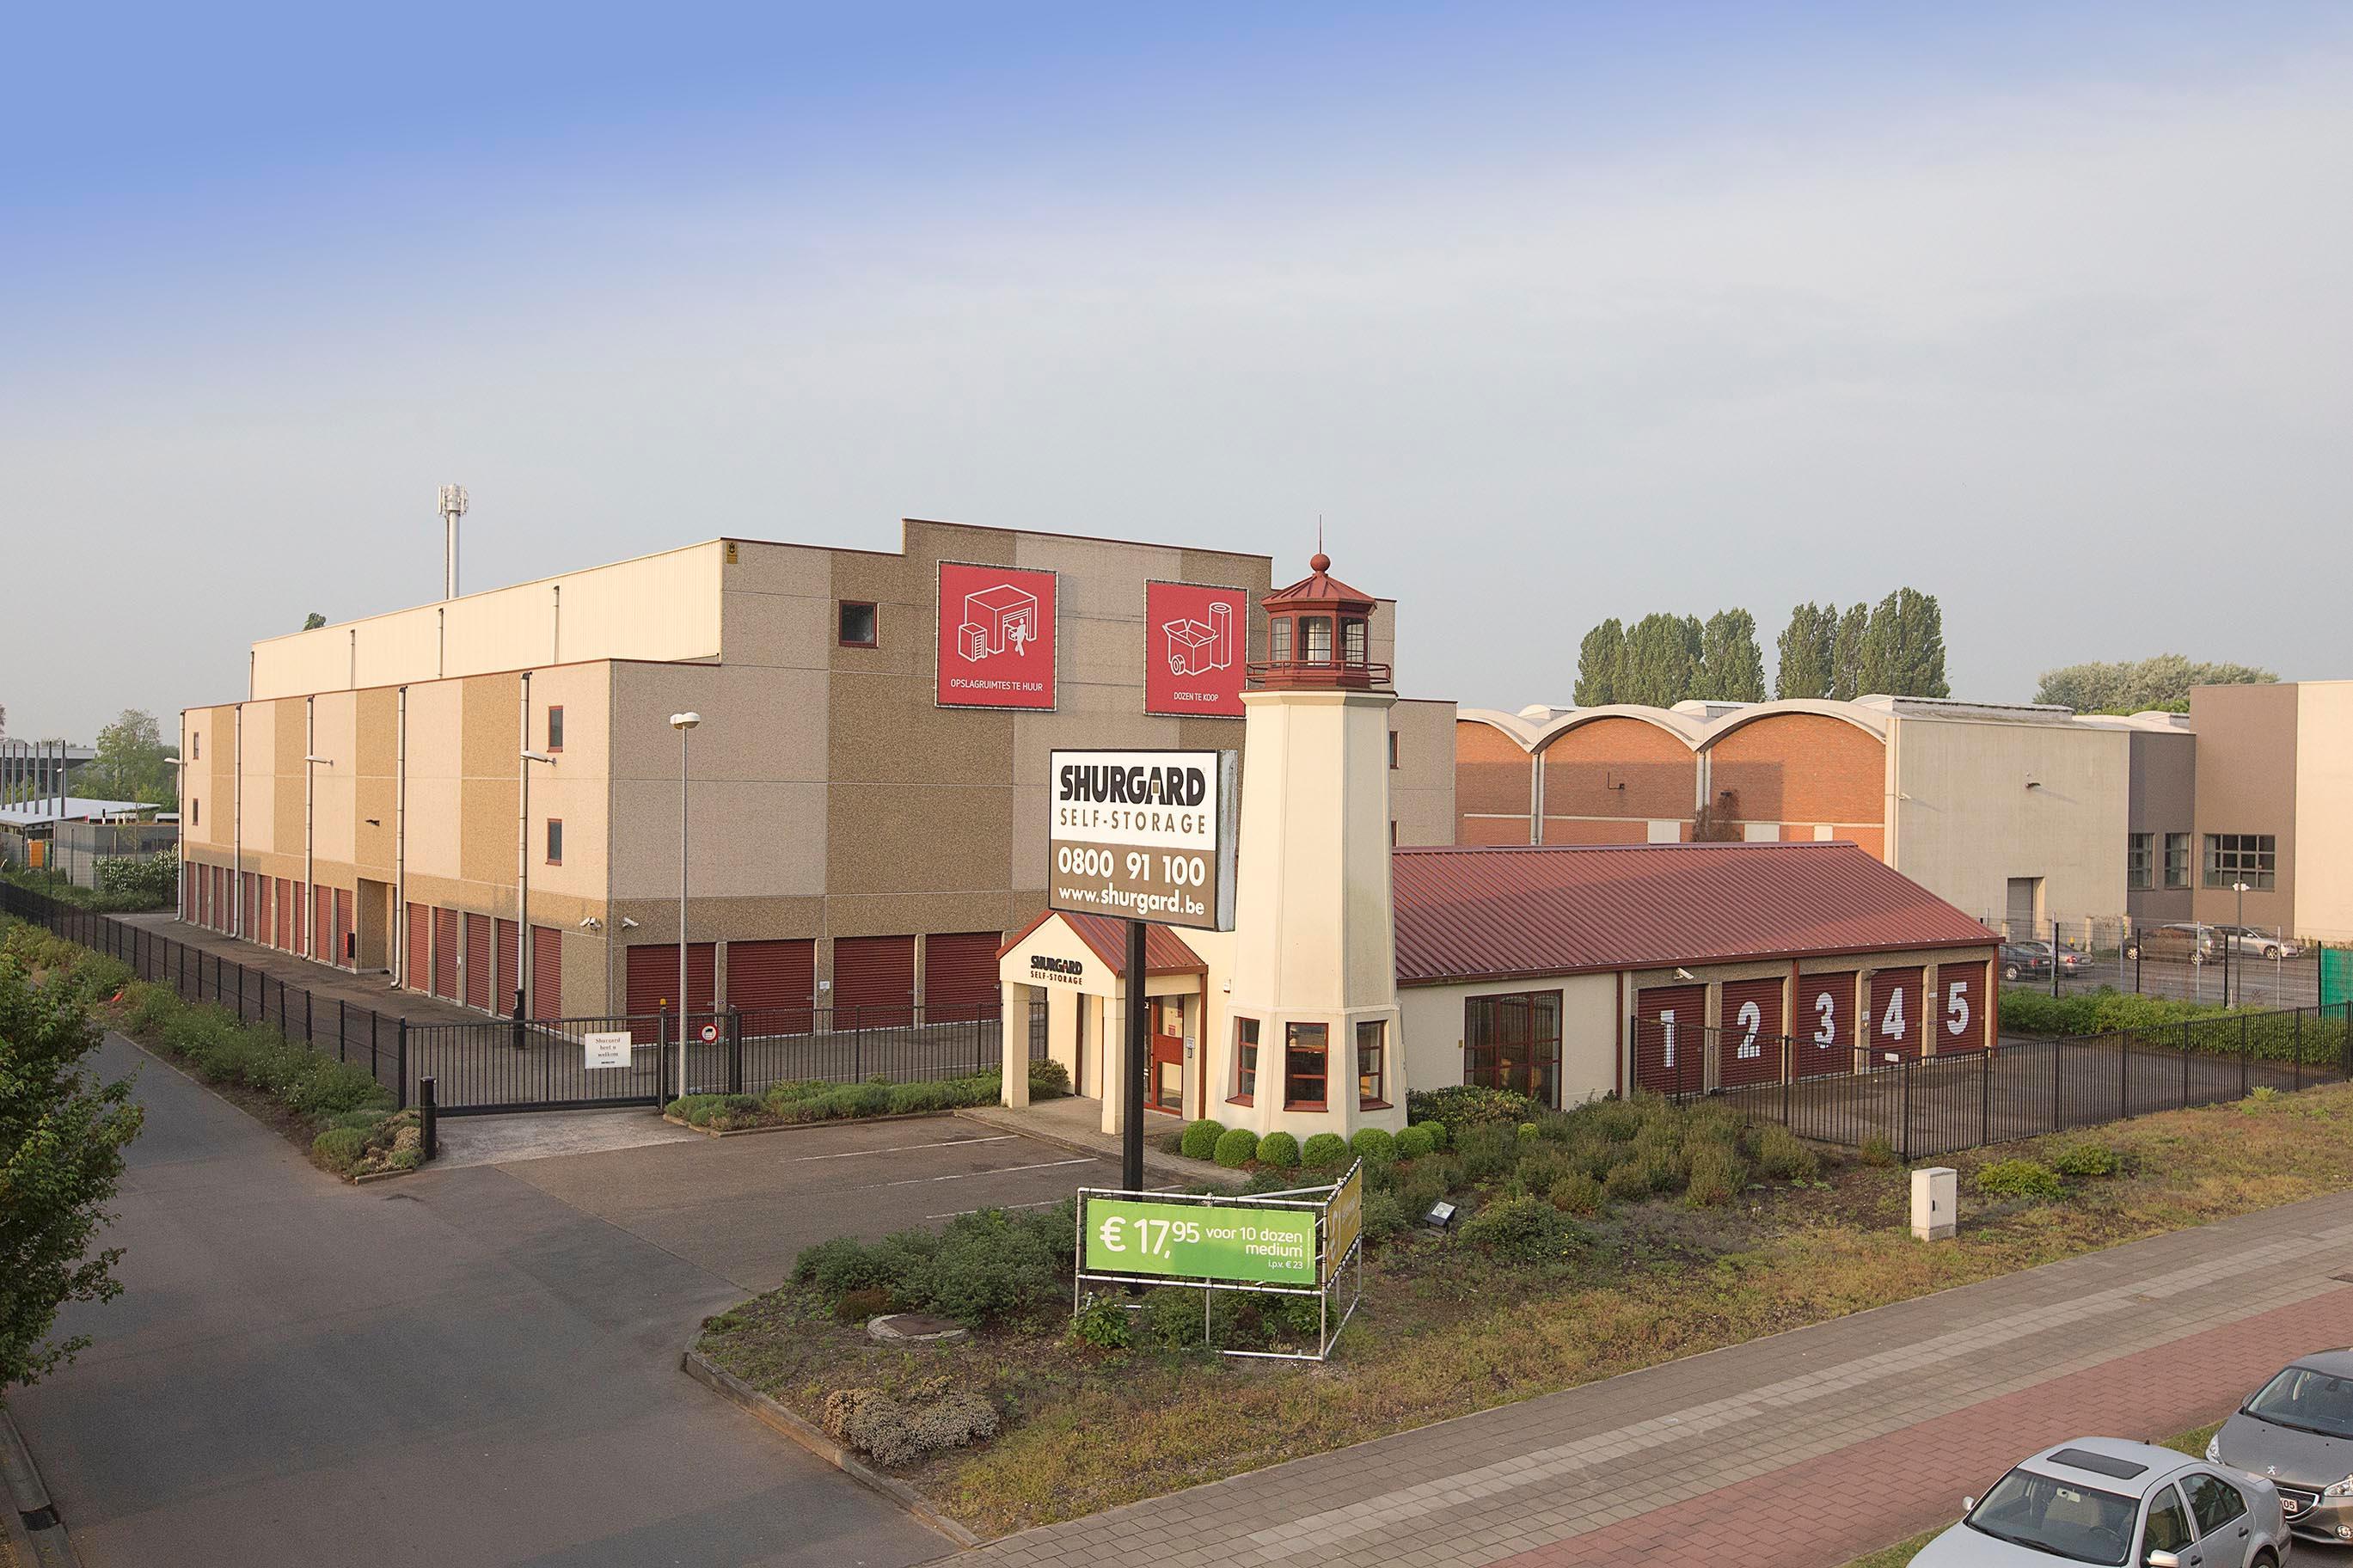 Shurgard Self-Storage Antwerpen Linkeroever